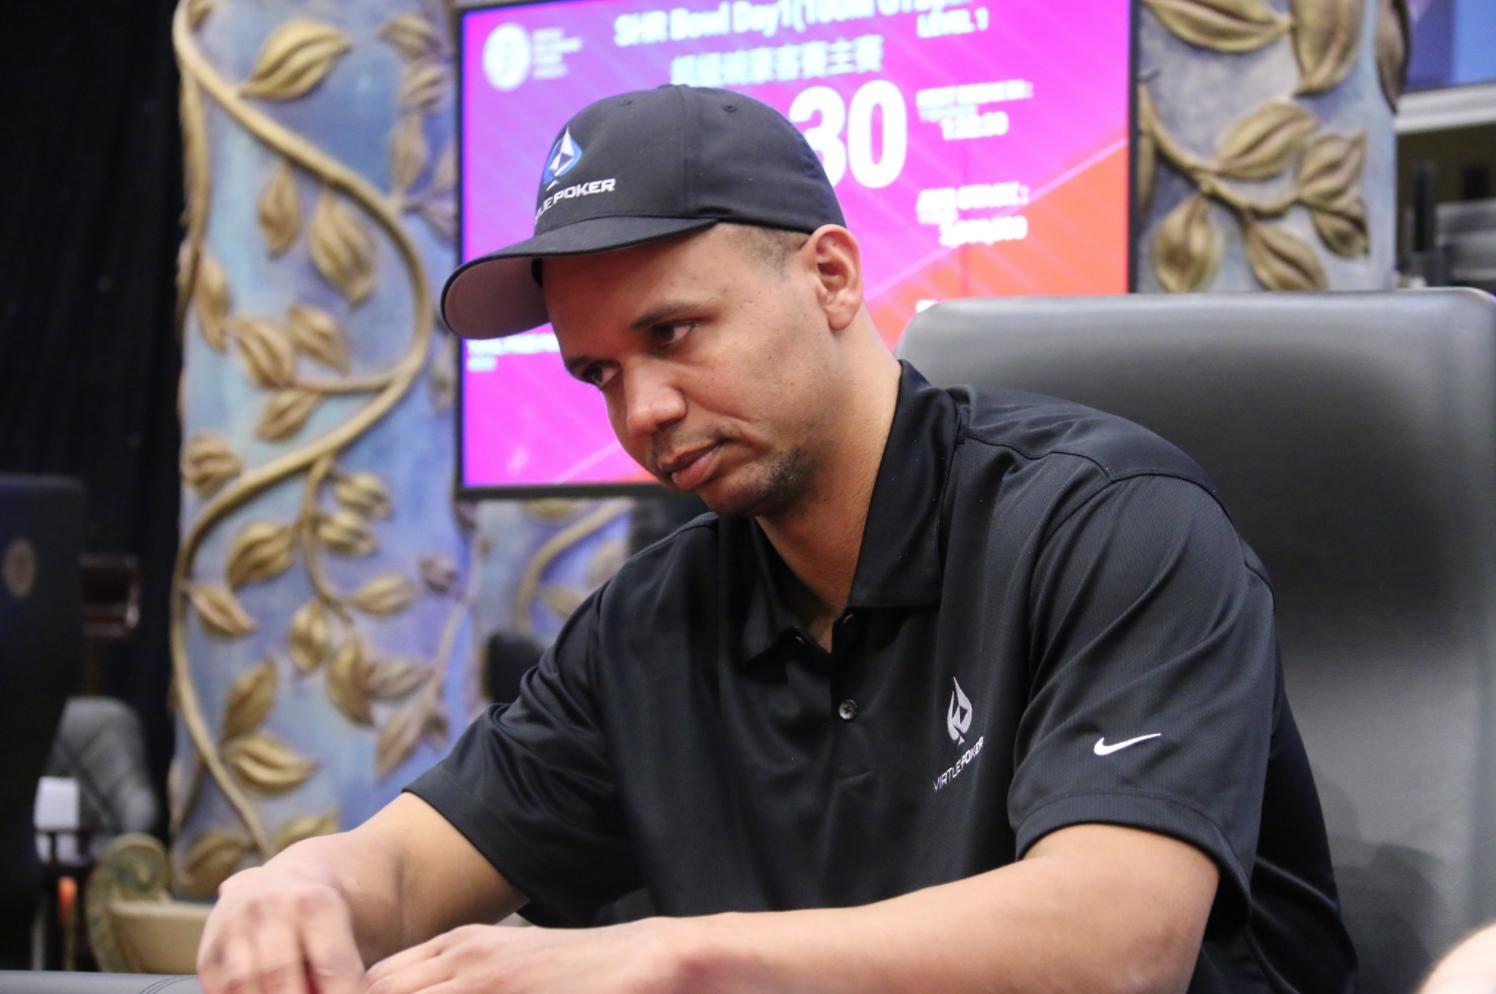 Skandal Casino Hohensyburg Poker